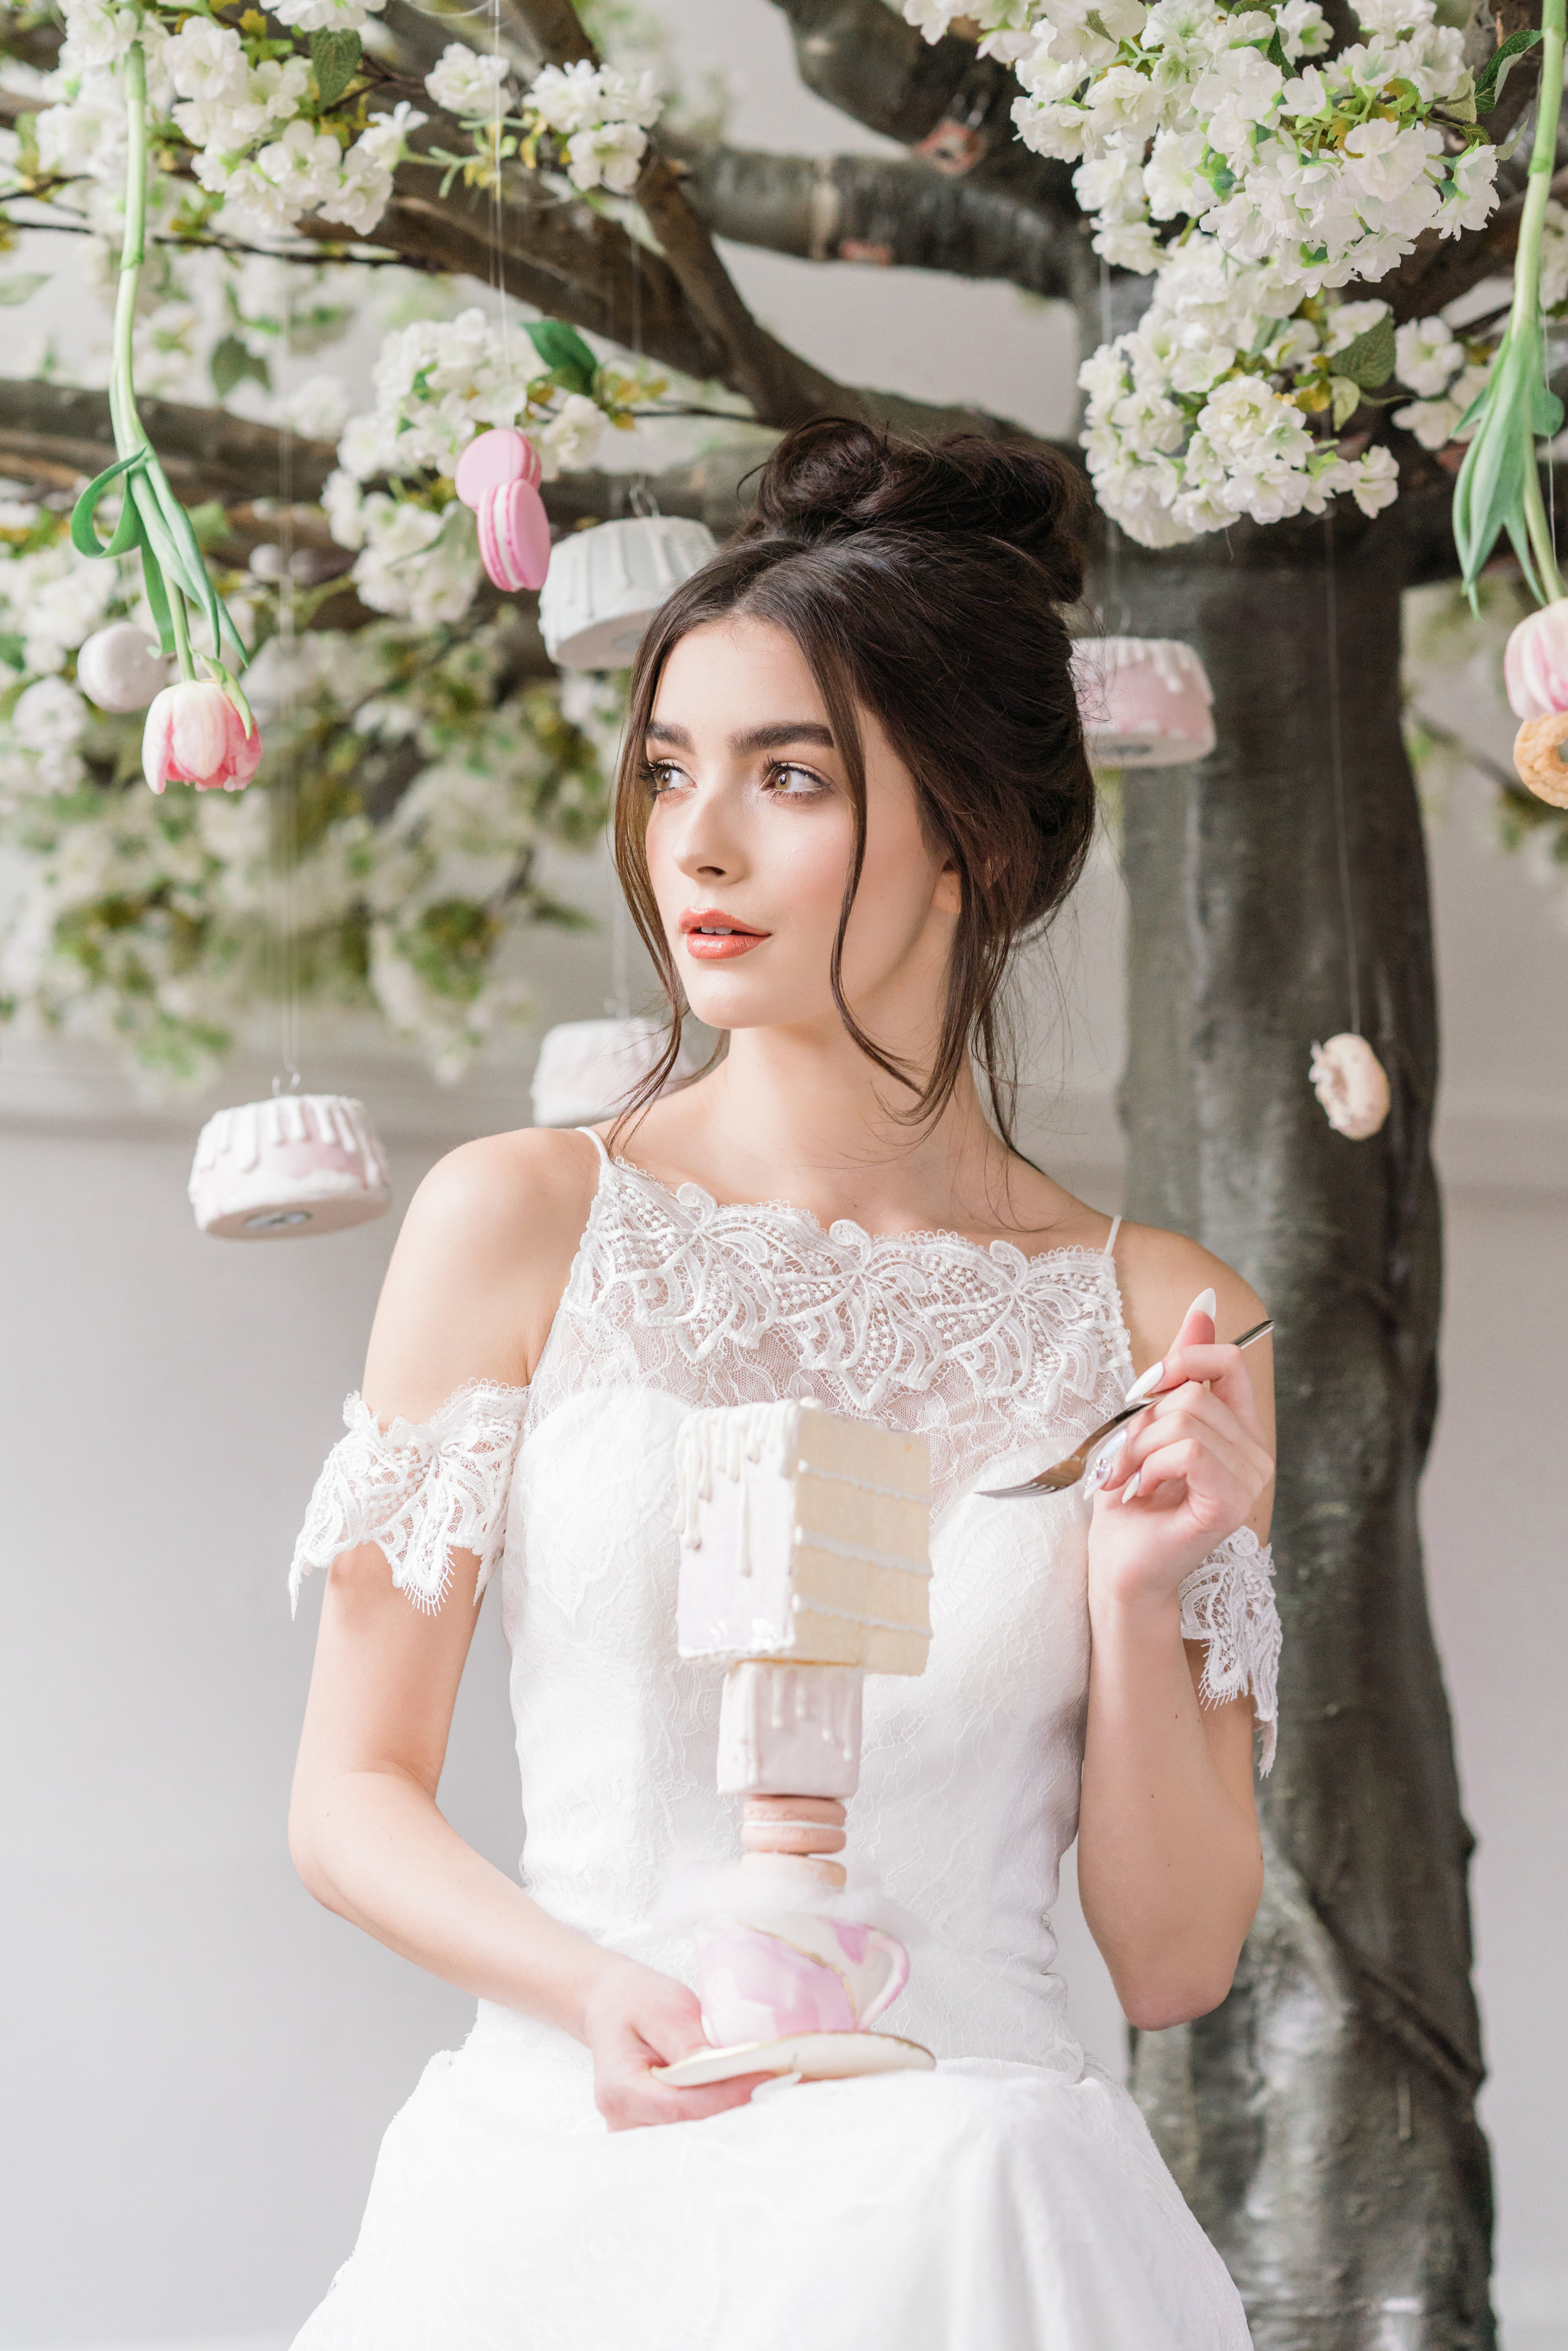 August In Bloom - Fantasy bride holding cake - Serene Dream (Wedluxe)